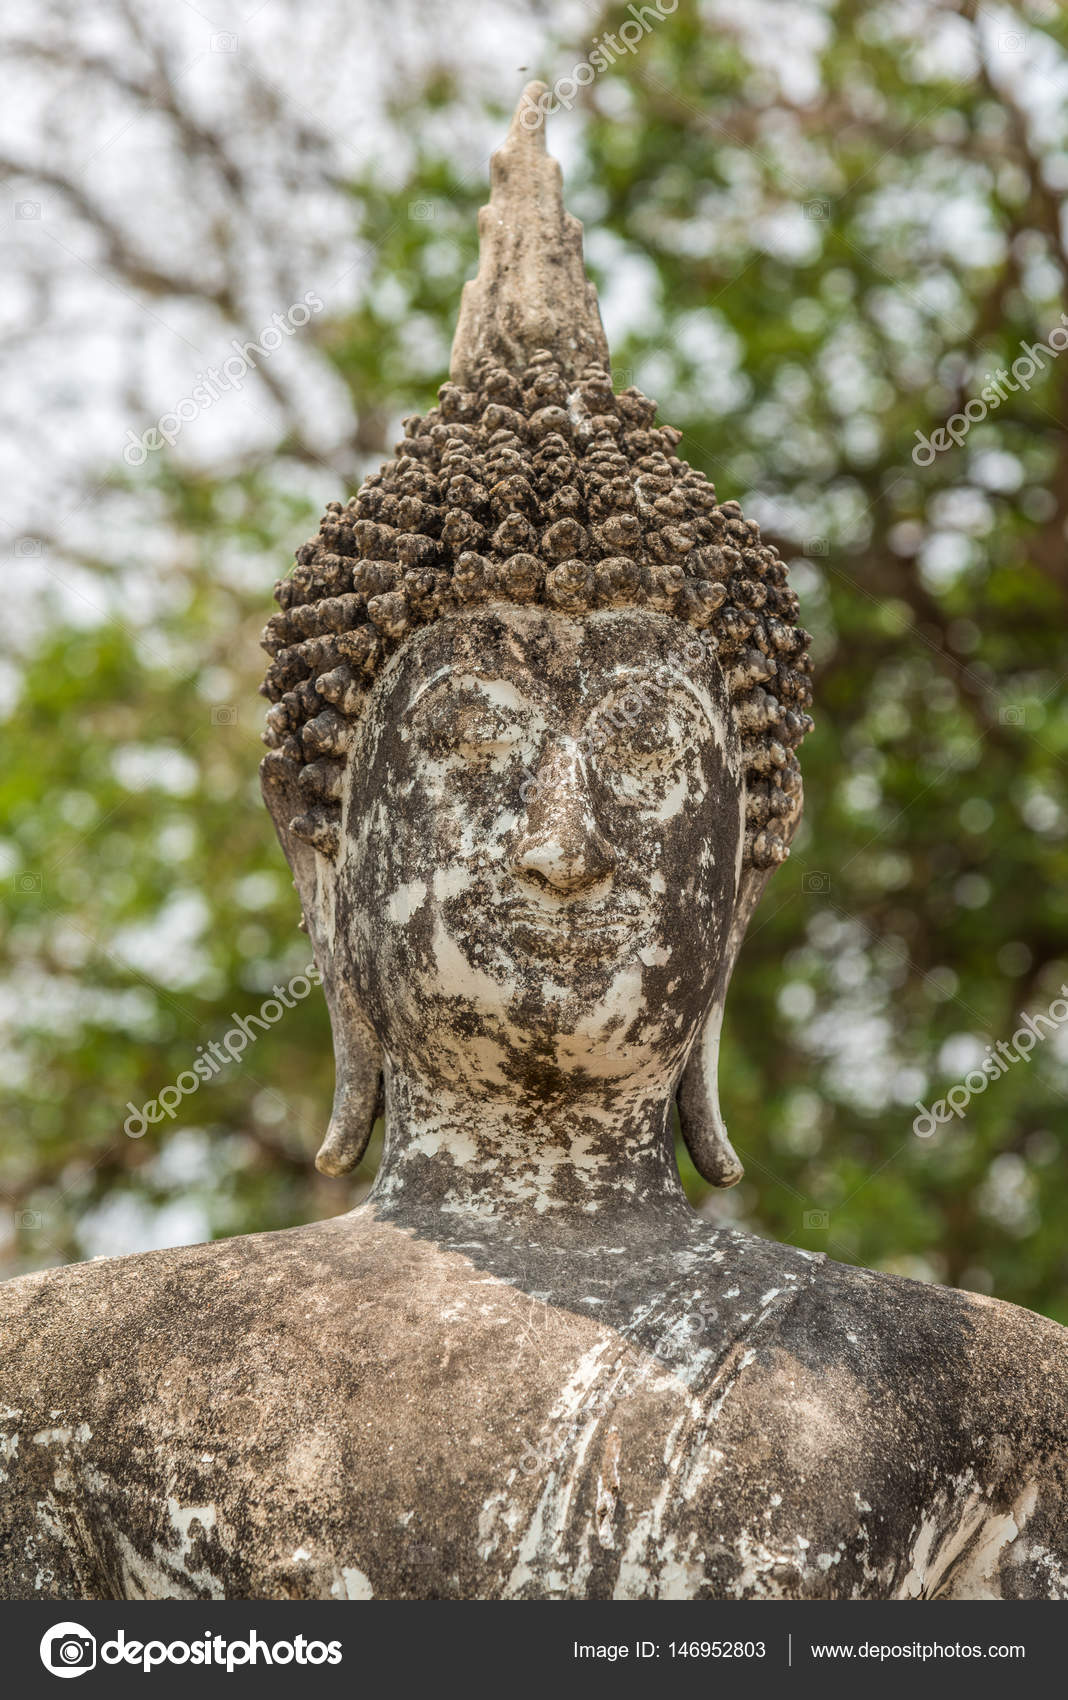 Boeddha Beeld Beton.Oude Betonnen Boeddha Beeld Stockfoto C Goldquest 146952803